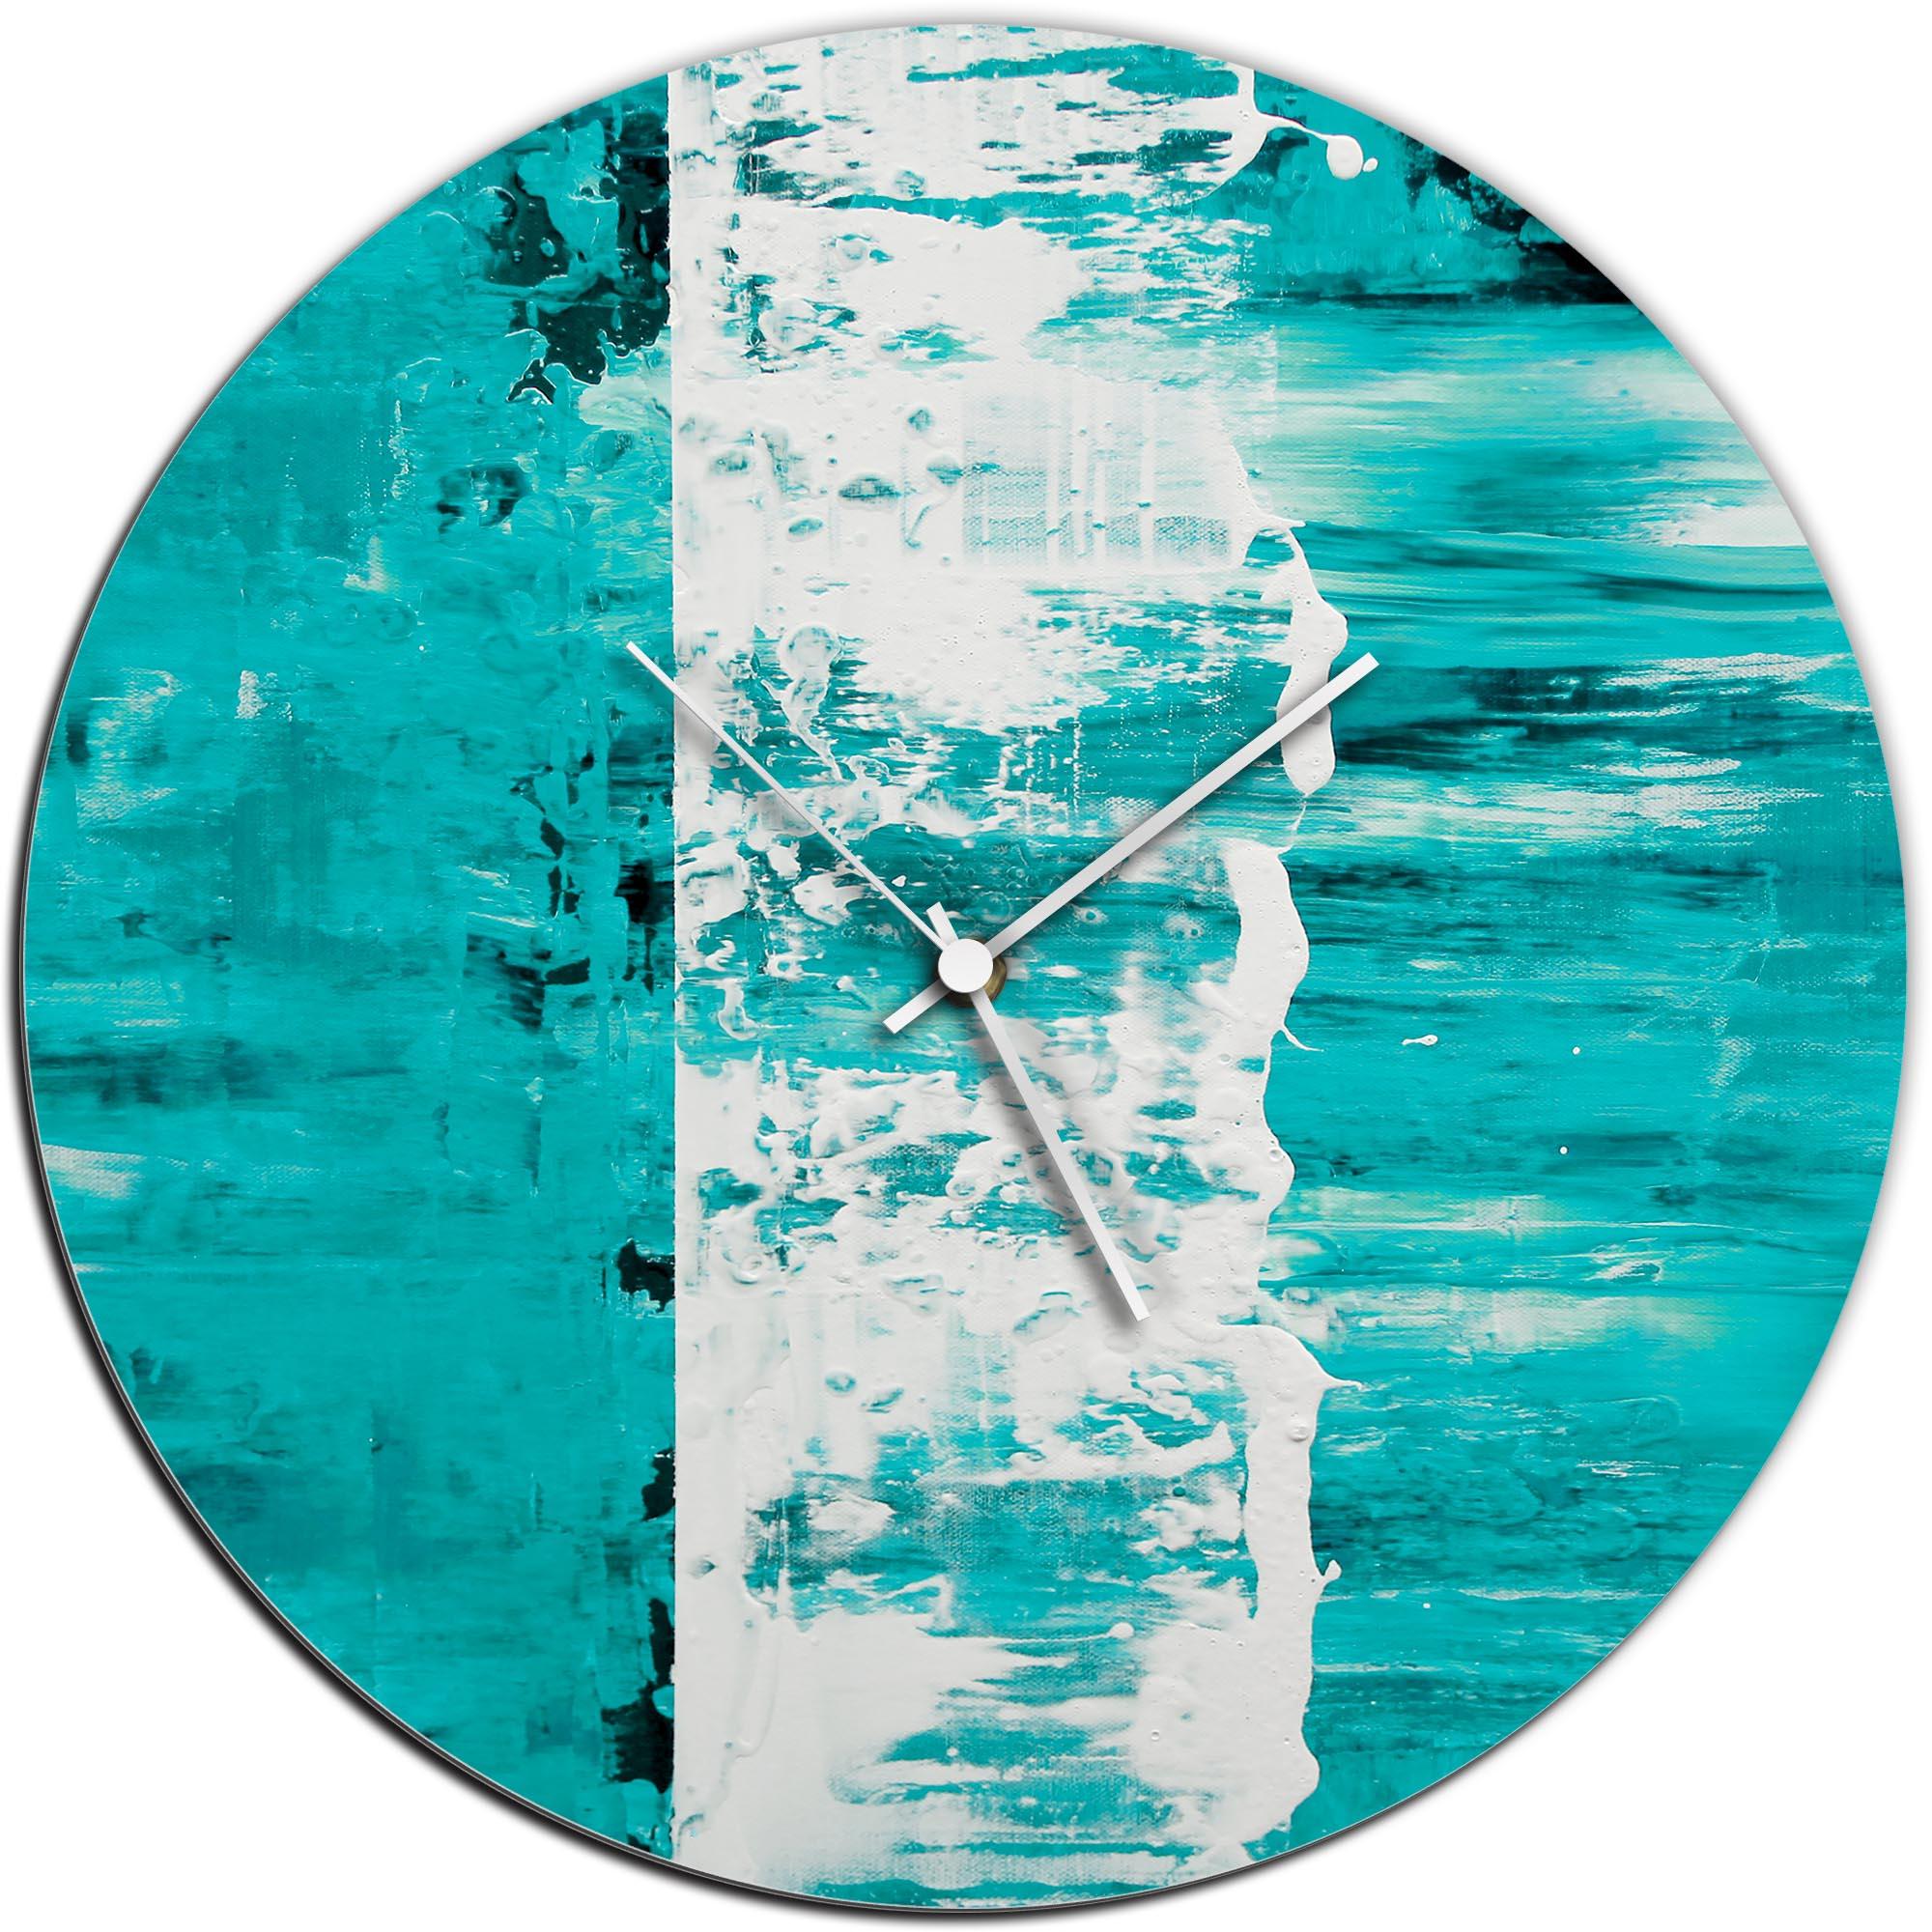 Mendo Vasilevski 'Teal Street Circle Clock Large' 22in x 22in Modern Wall Clock on Aluminum Composite